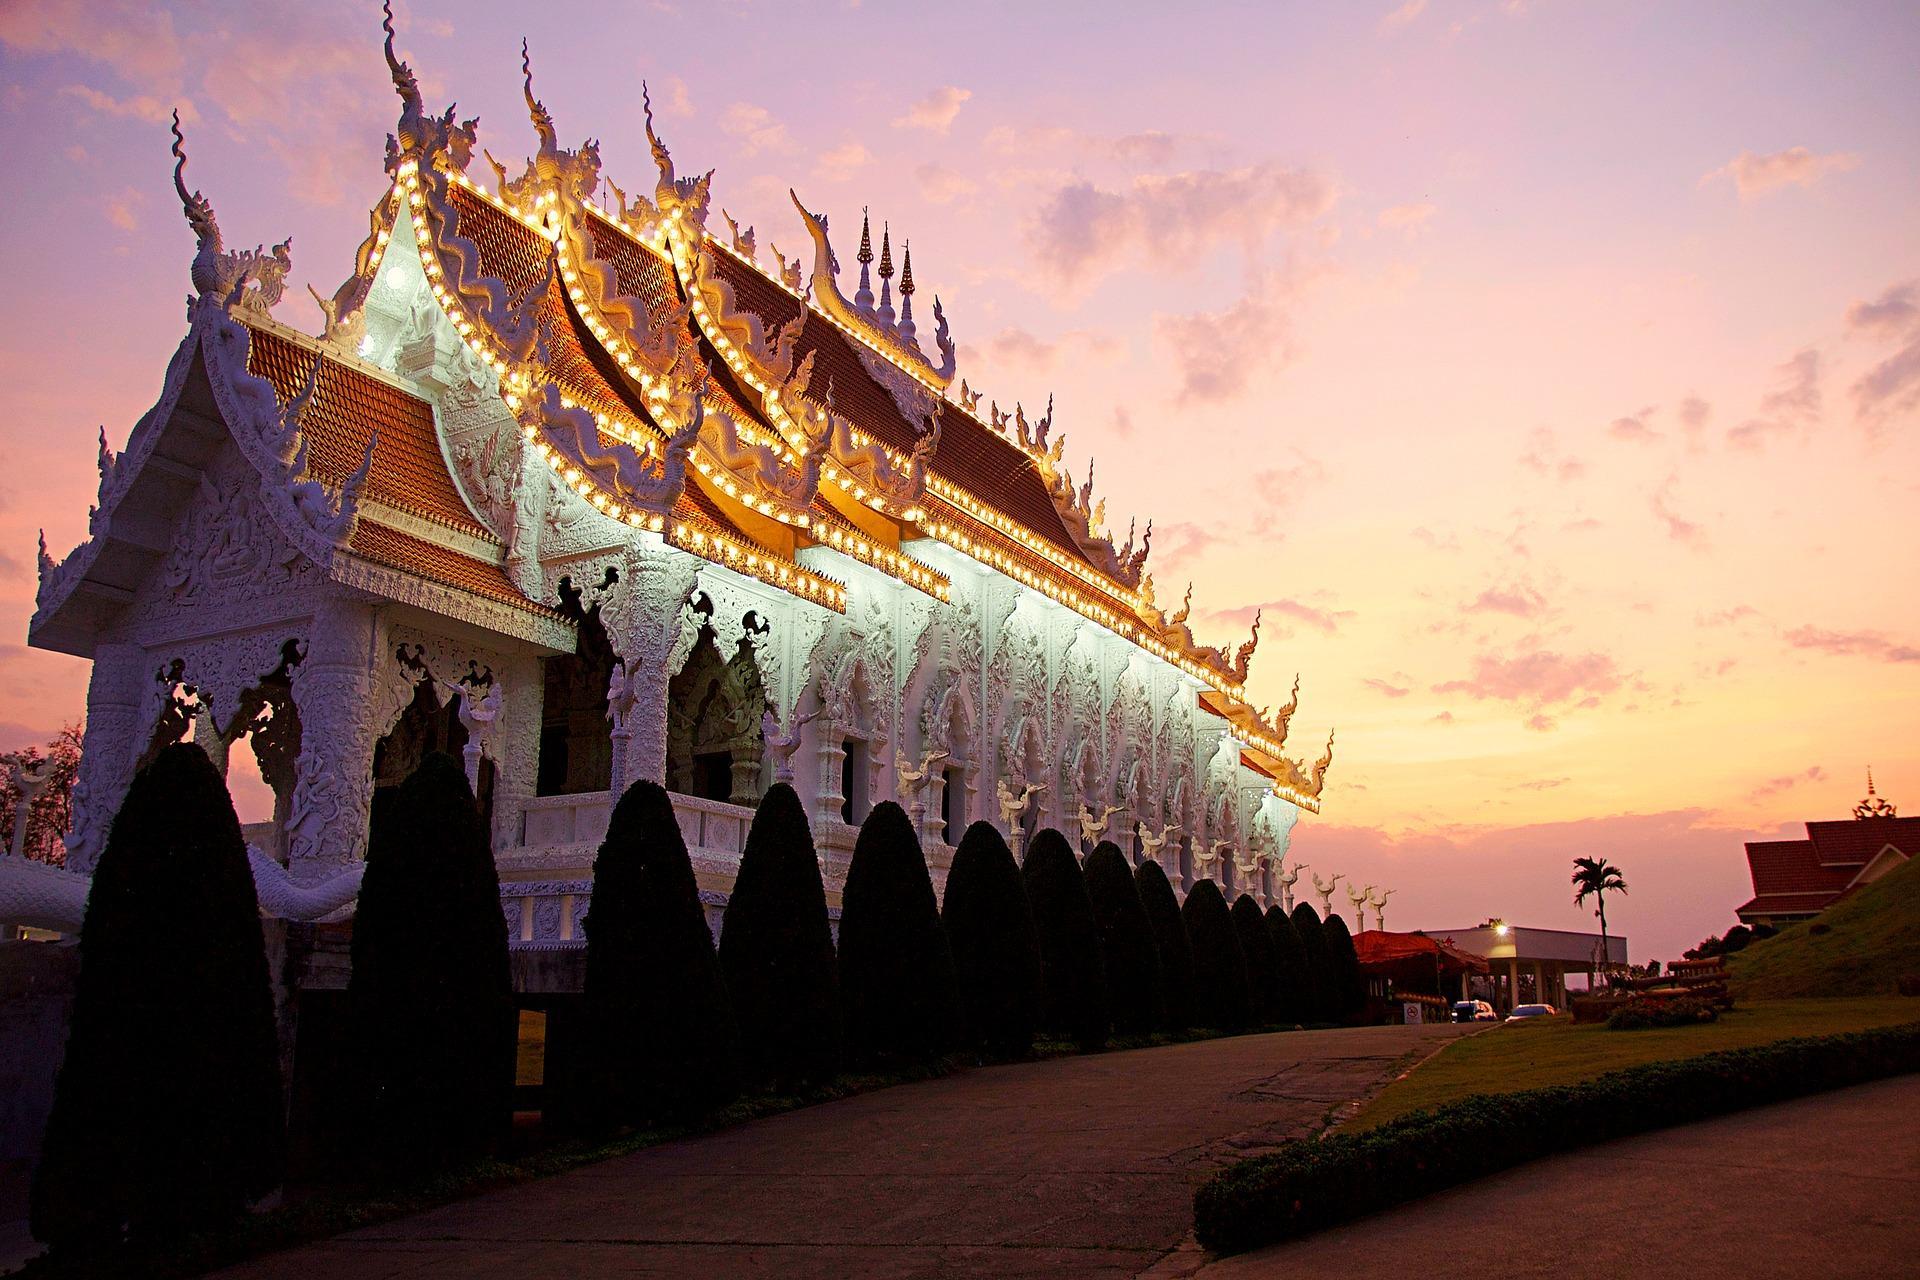 /optitravel/online/www/layout22/single_product.php?pkt_id=144&Produto=Bangkok & Maravilhas do Norte (Regular) & Phuket&destino=TAILÂNDIA